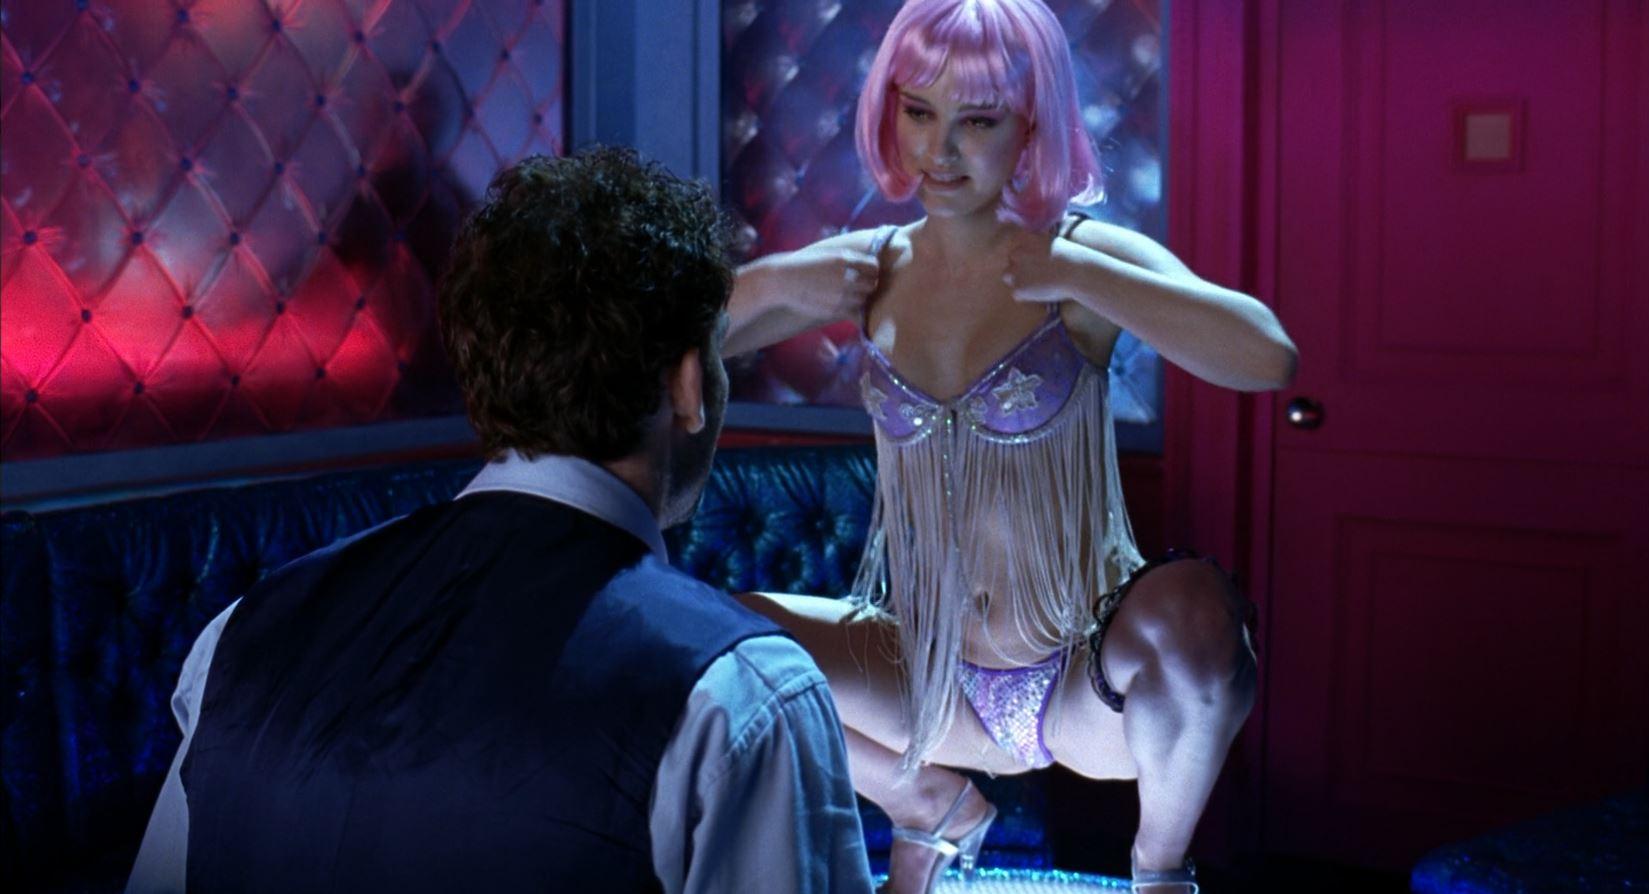 Closer - Natalie Portman in a thong 3